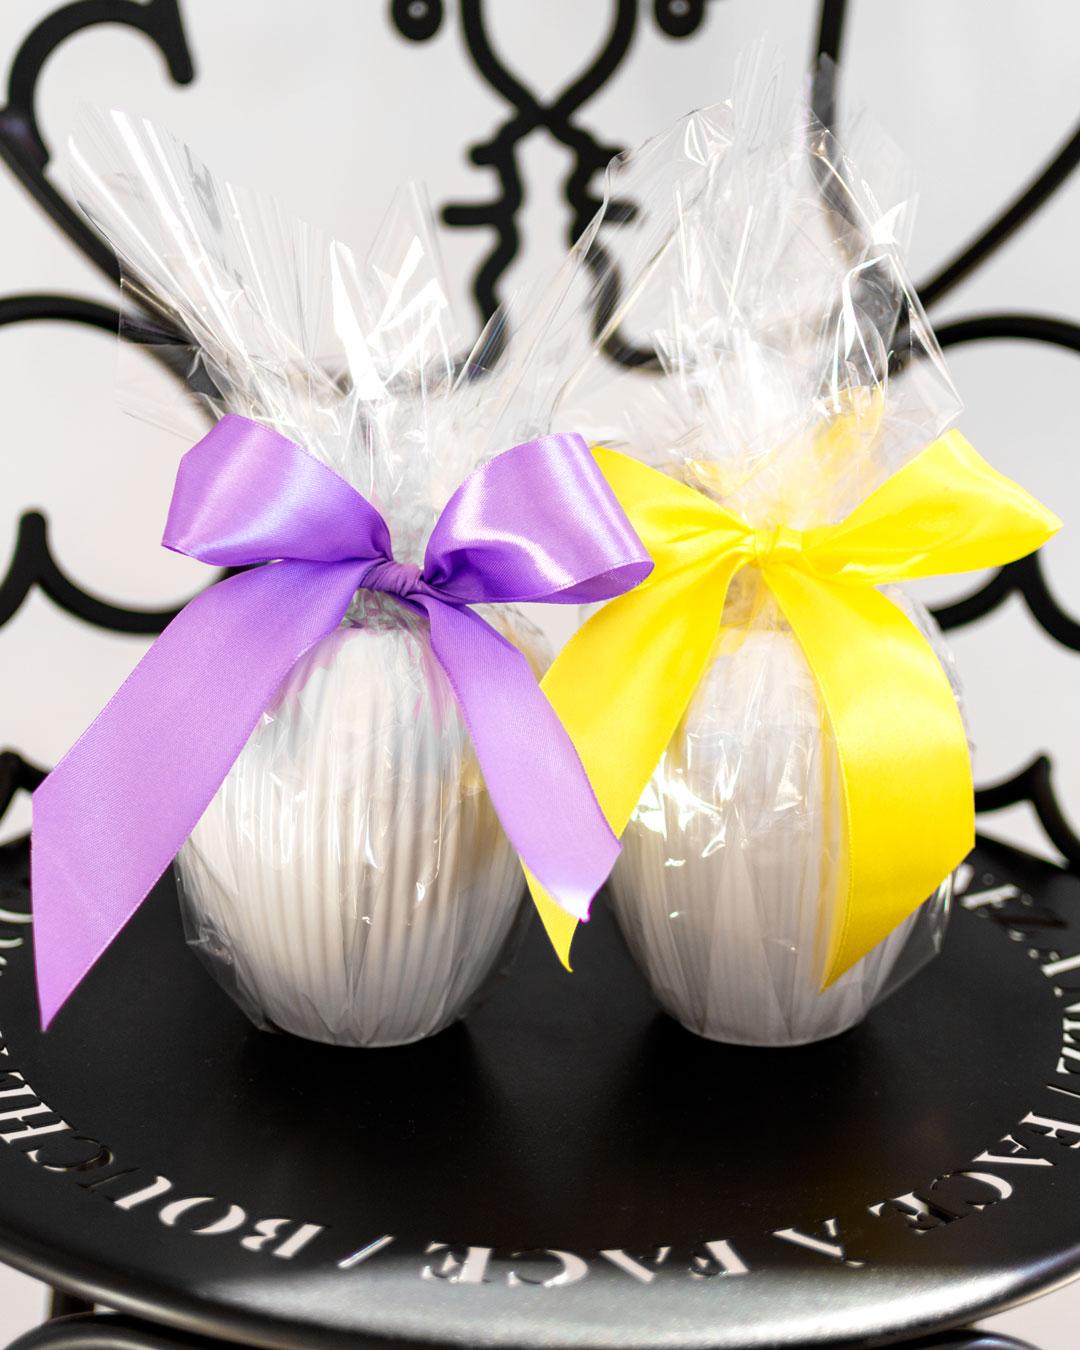 To små hvide vaser fra Michael Andersen Keramik Model 4767 pakket ind i cellofan som påskeæg med lille og gul sløjfe på sort englestol